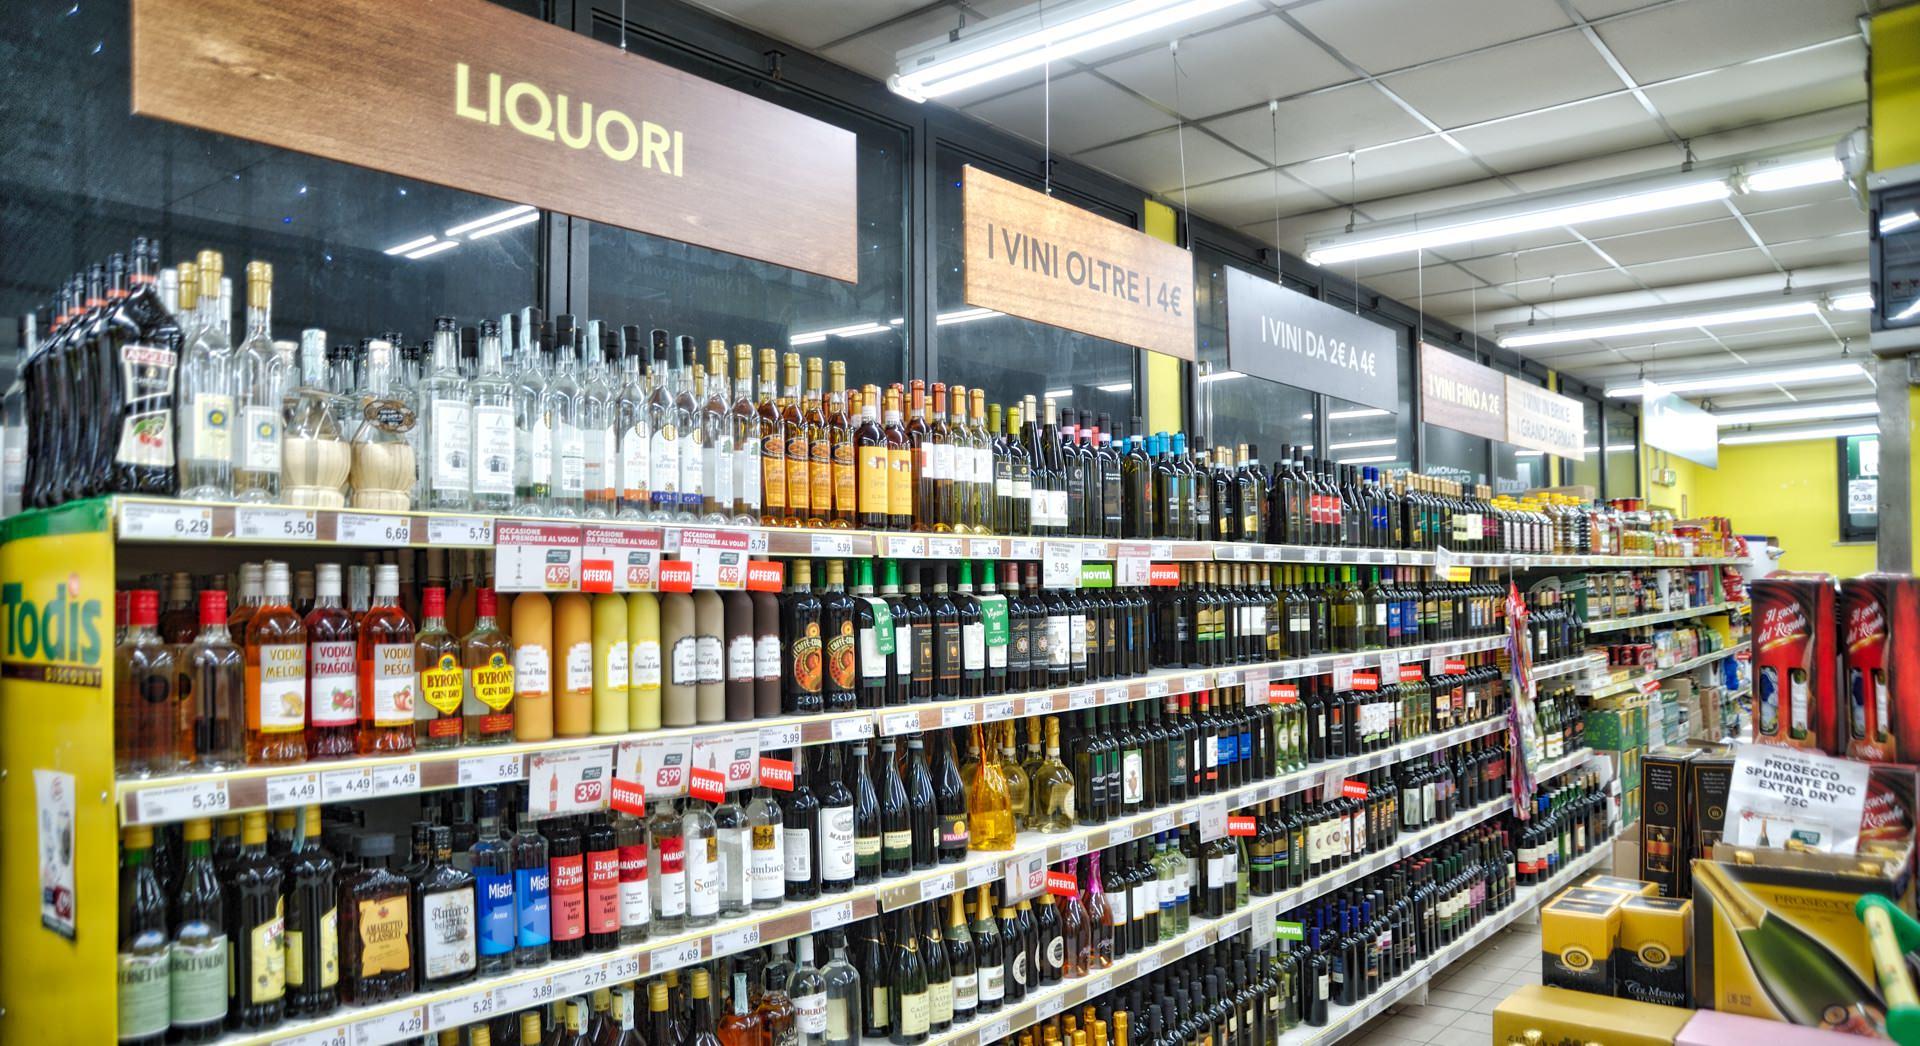 todis Alfonsine reparto liquori renis group